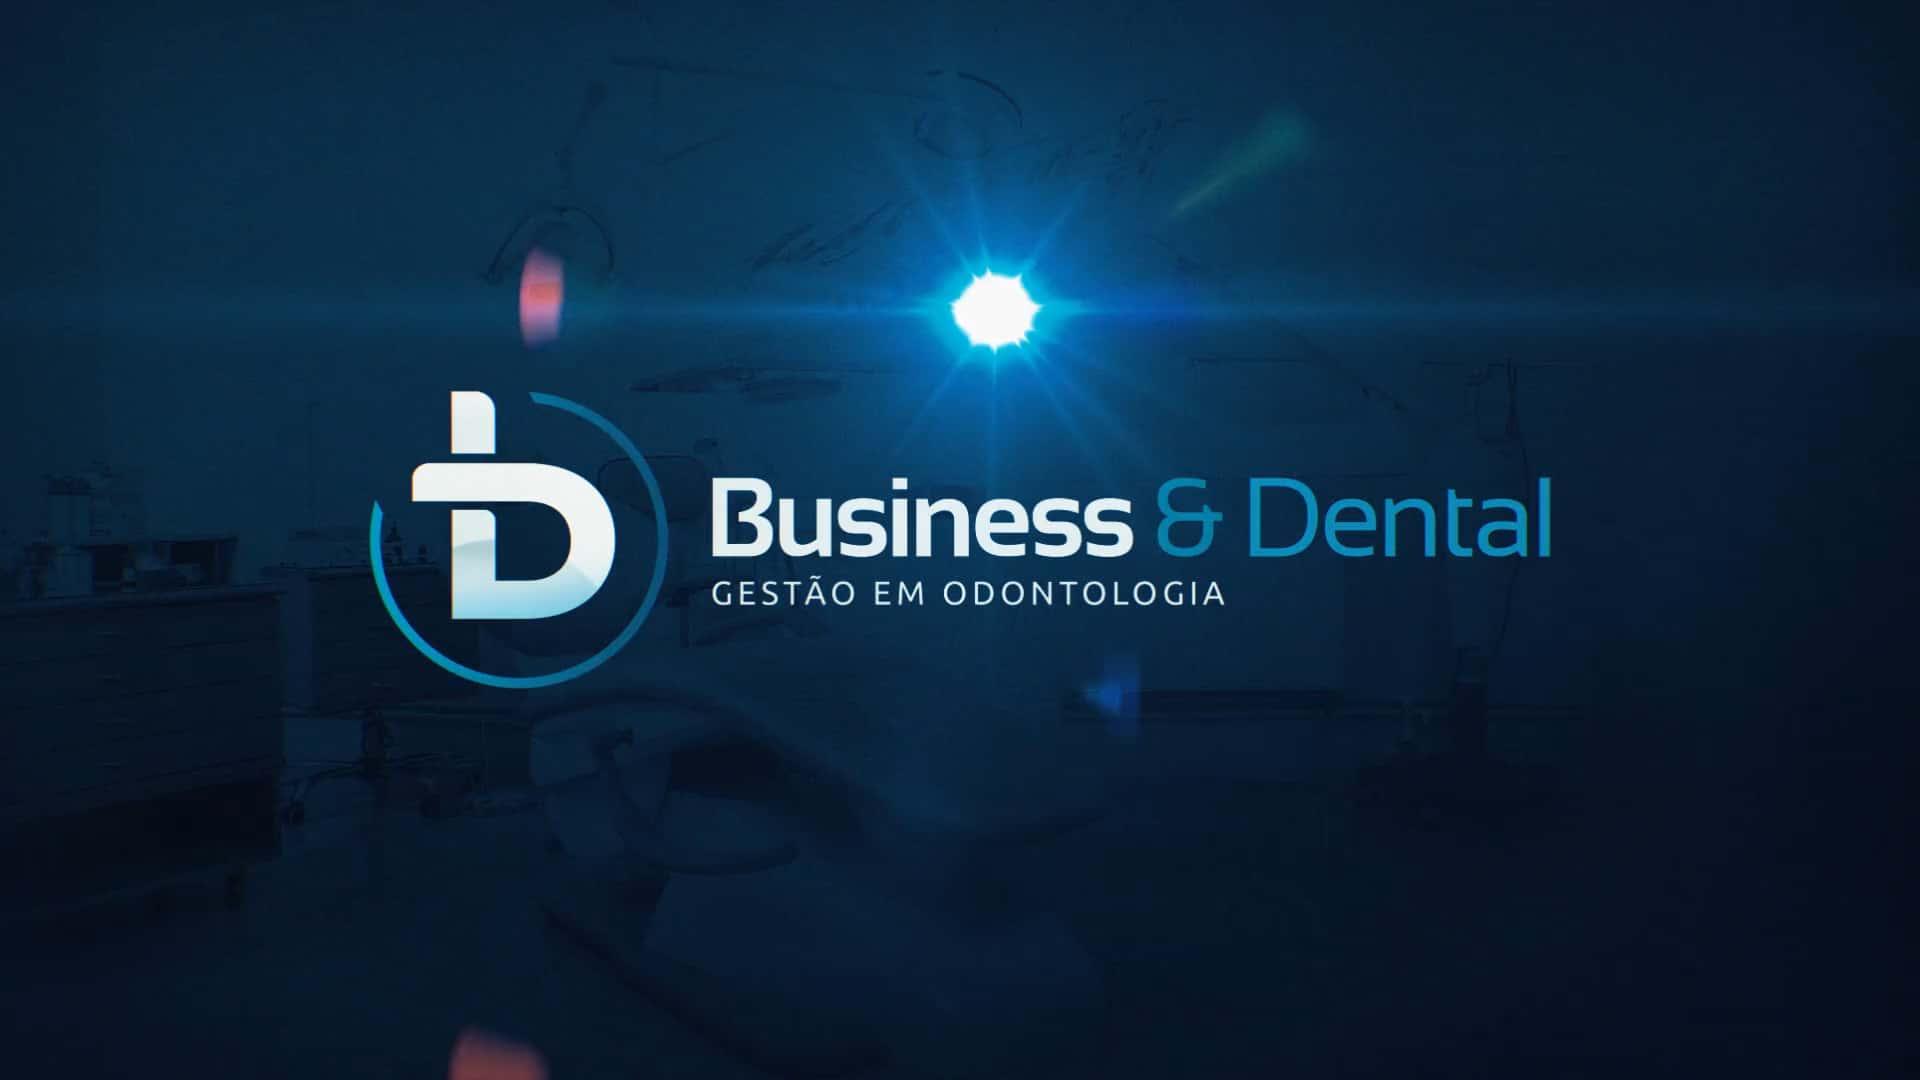 Business & Dental